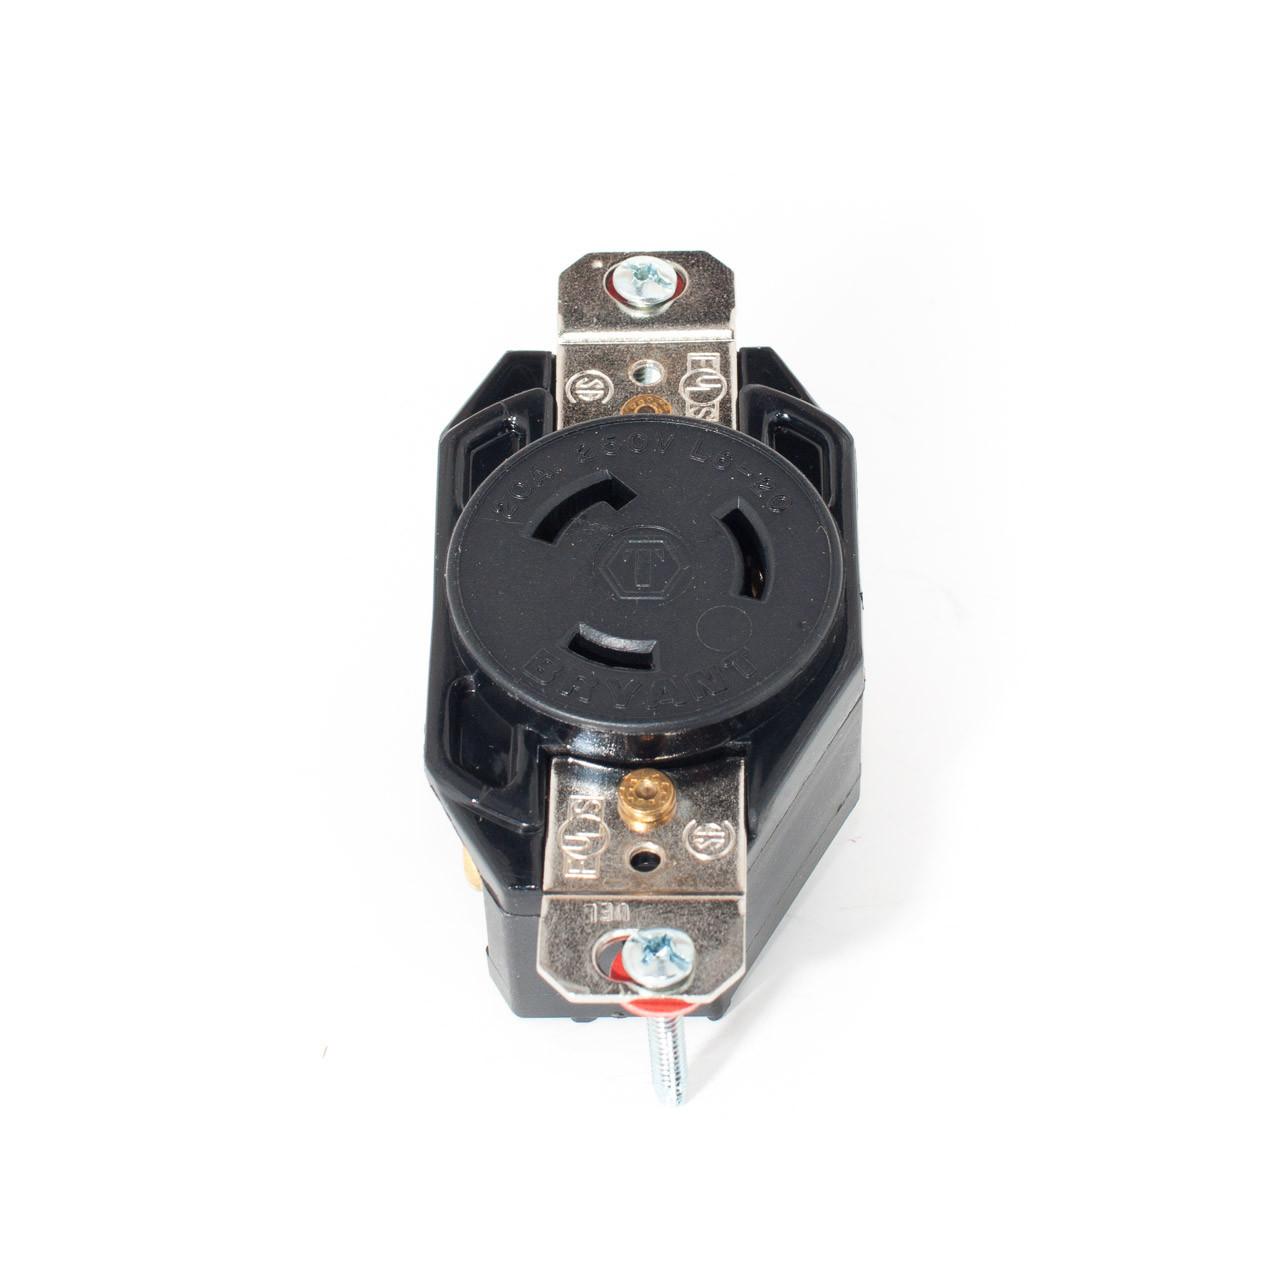 l6 20 2p3w 20a 250v twist lock receptacle tremtech. Black Bedroom Furniture Sets. Home Design Ideas